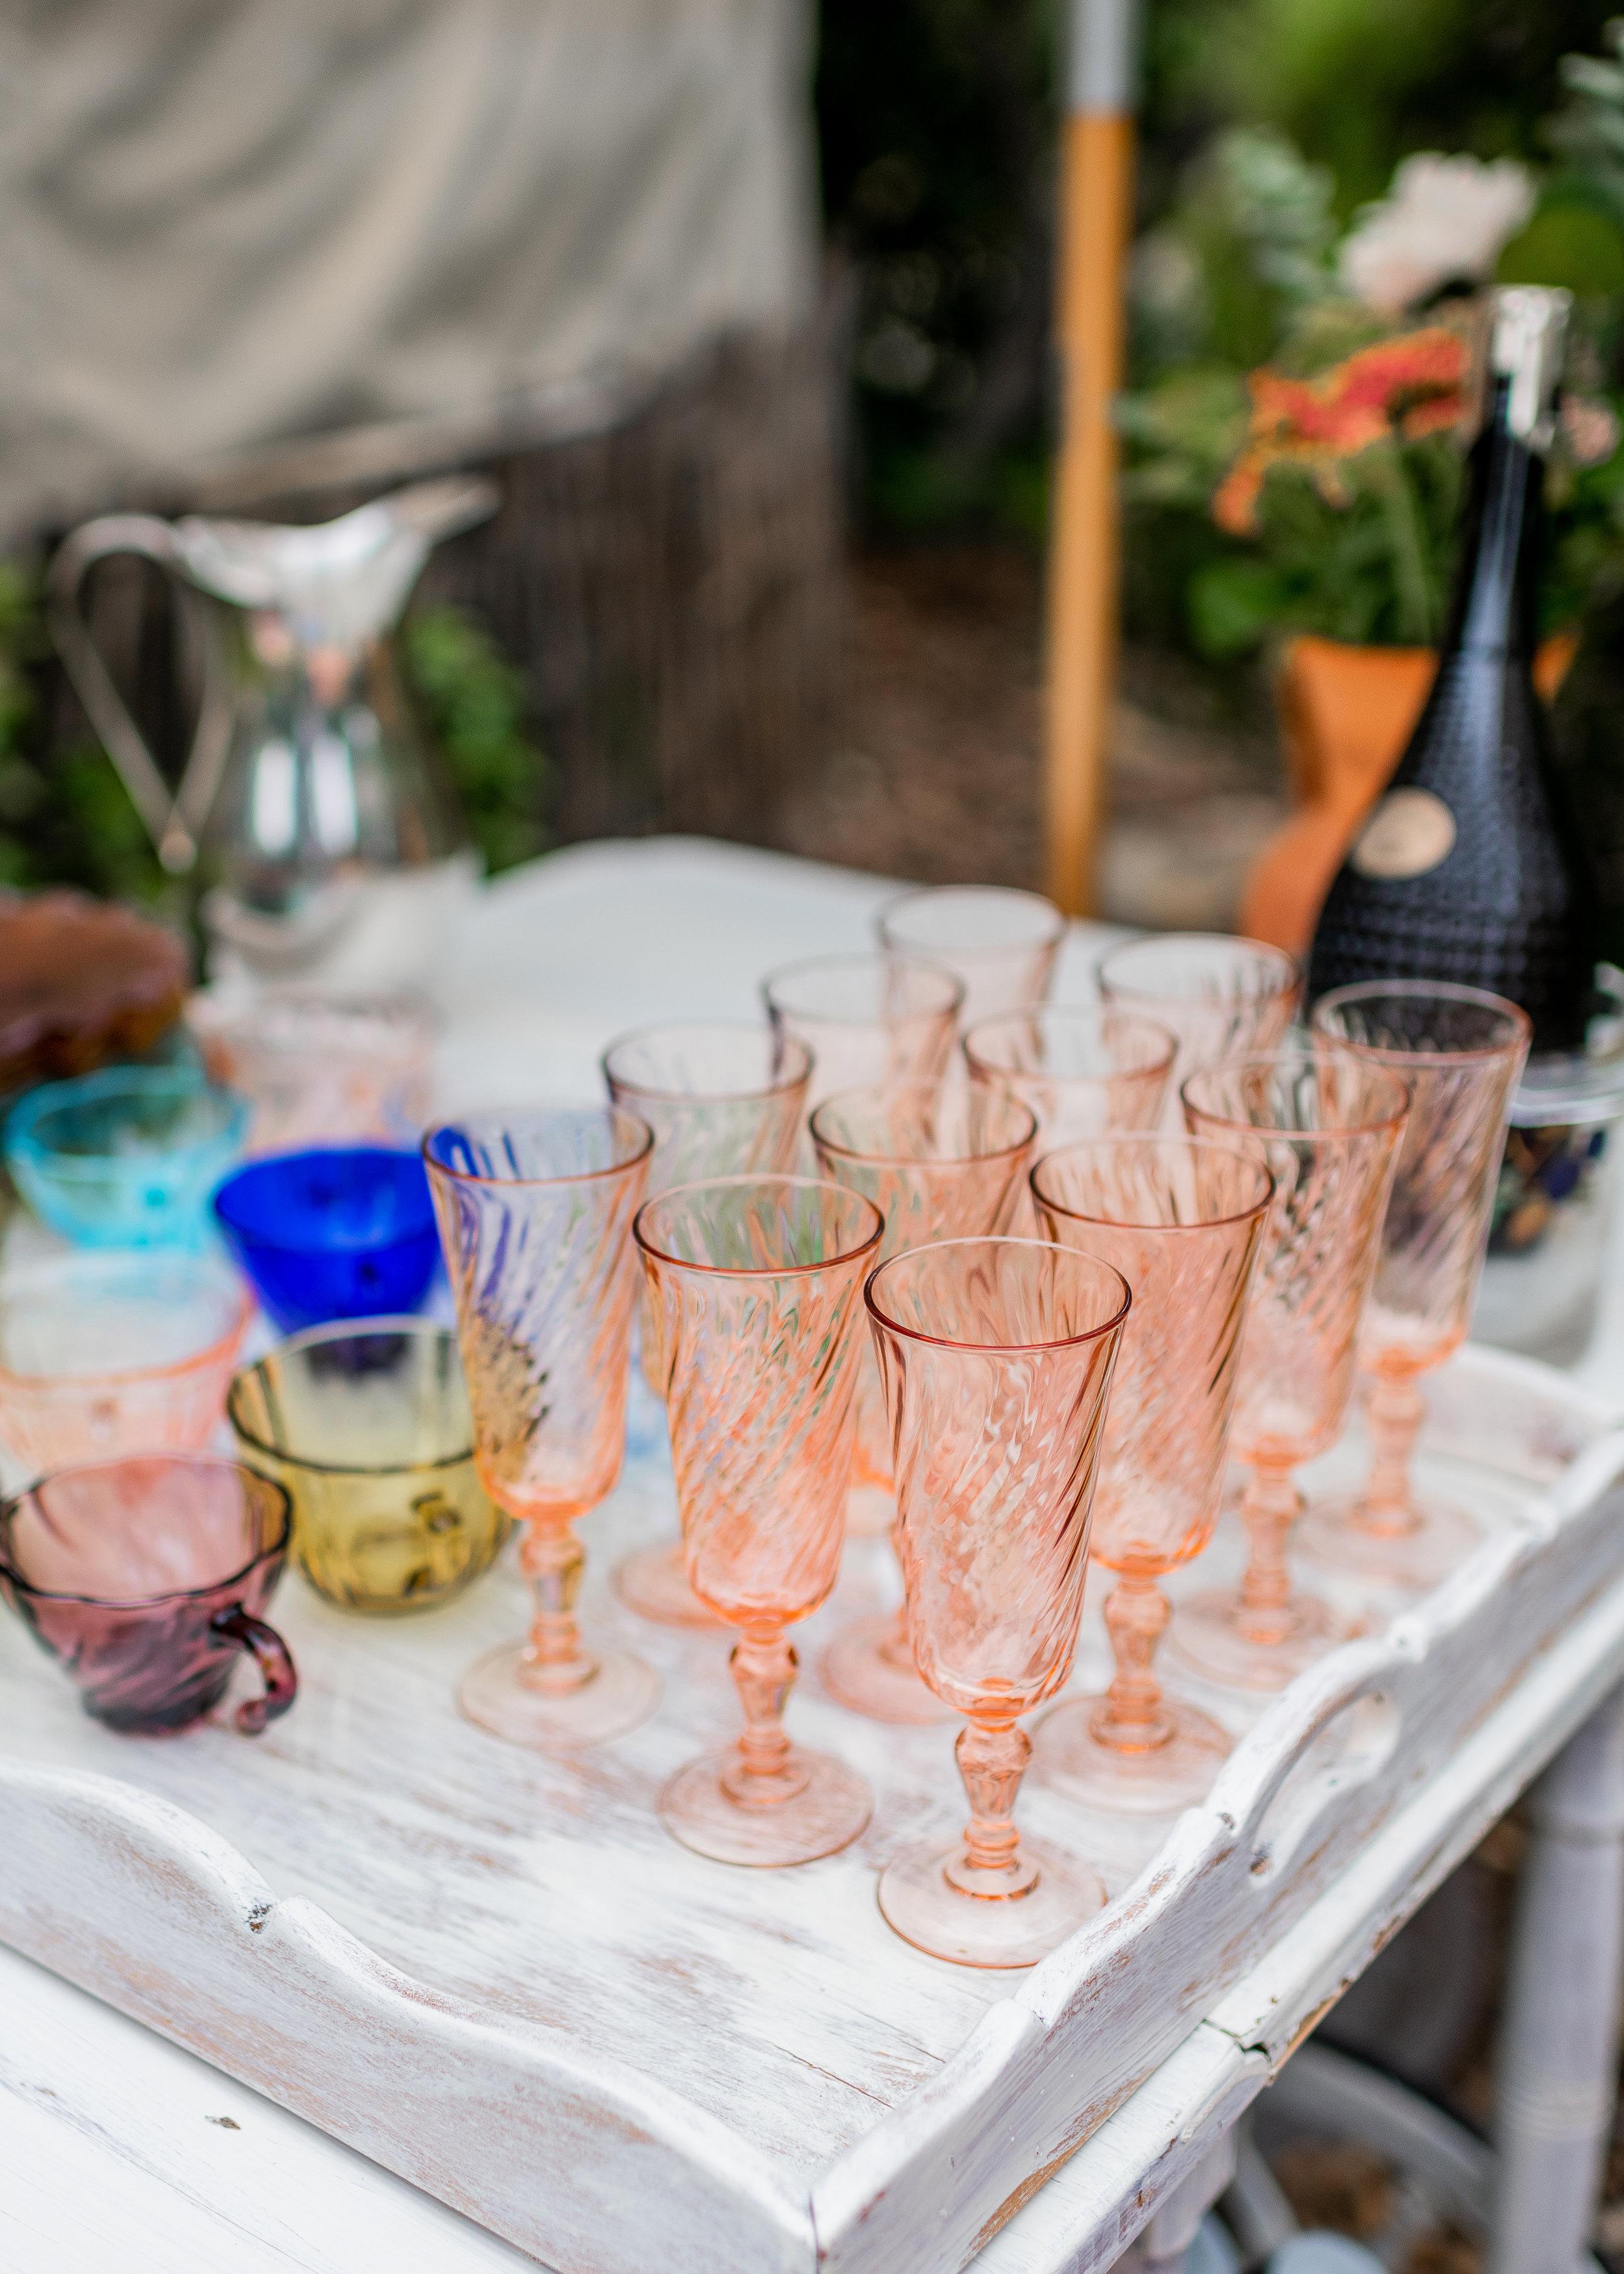 www.santabarbarawedding.com | Willa Kveta Photography | Santa Barbara Classic Weddings | Officiant Event | Drinks